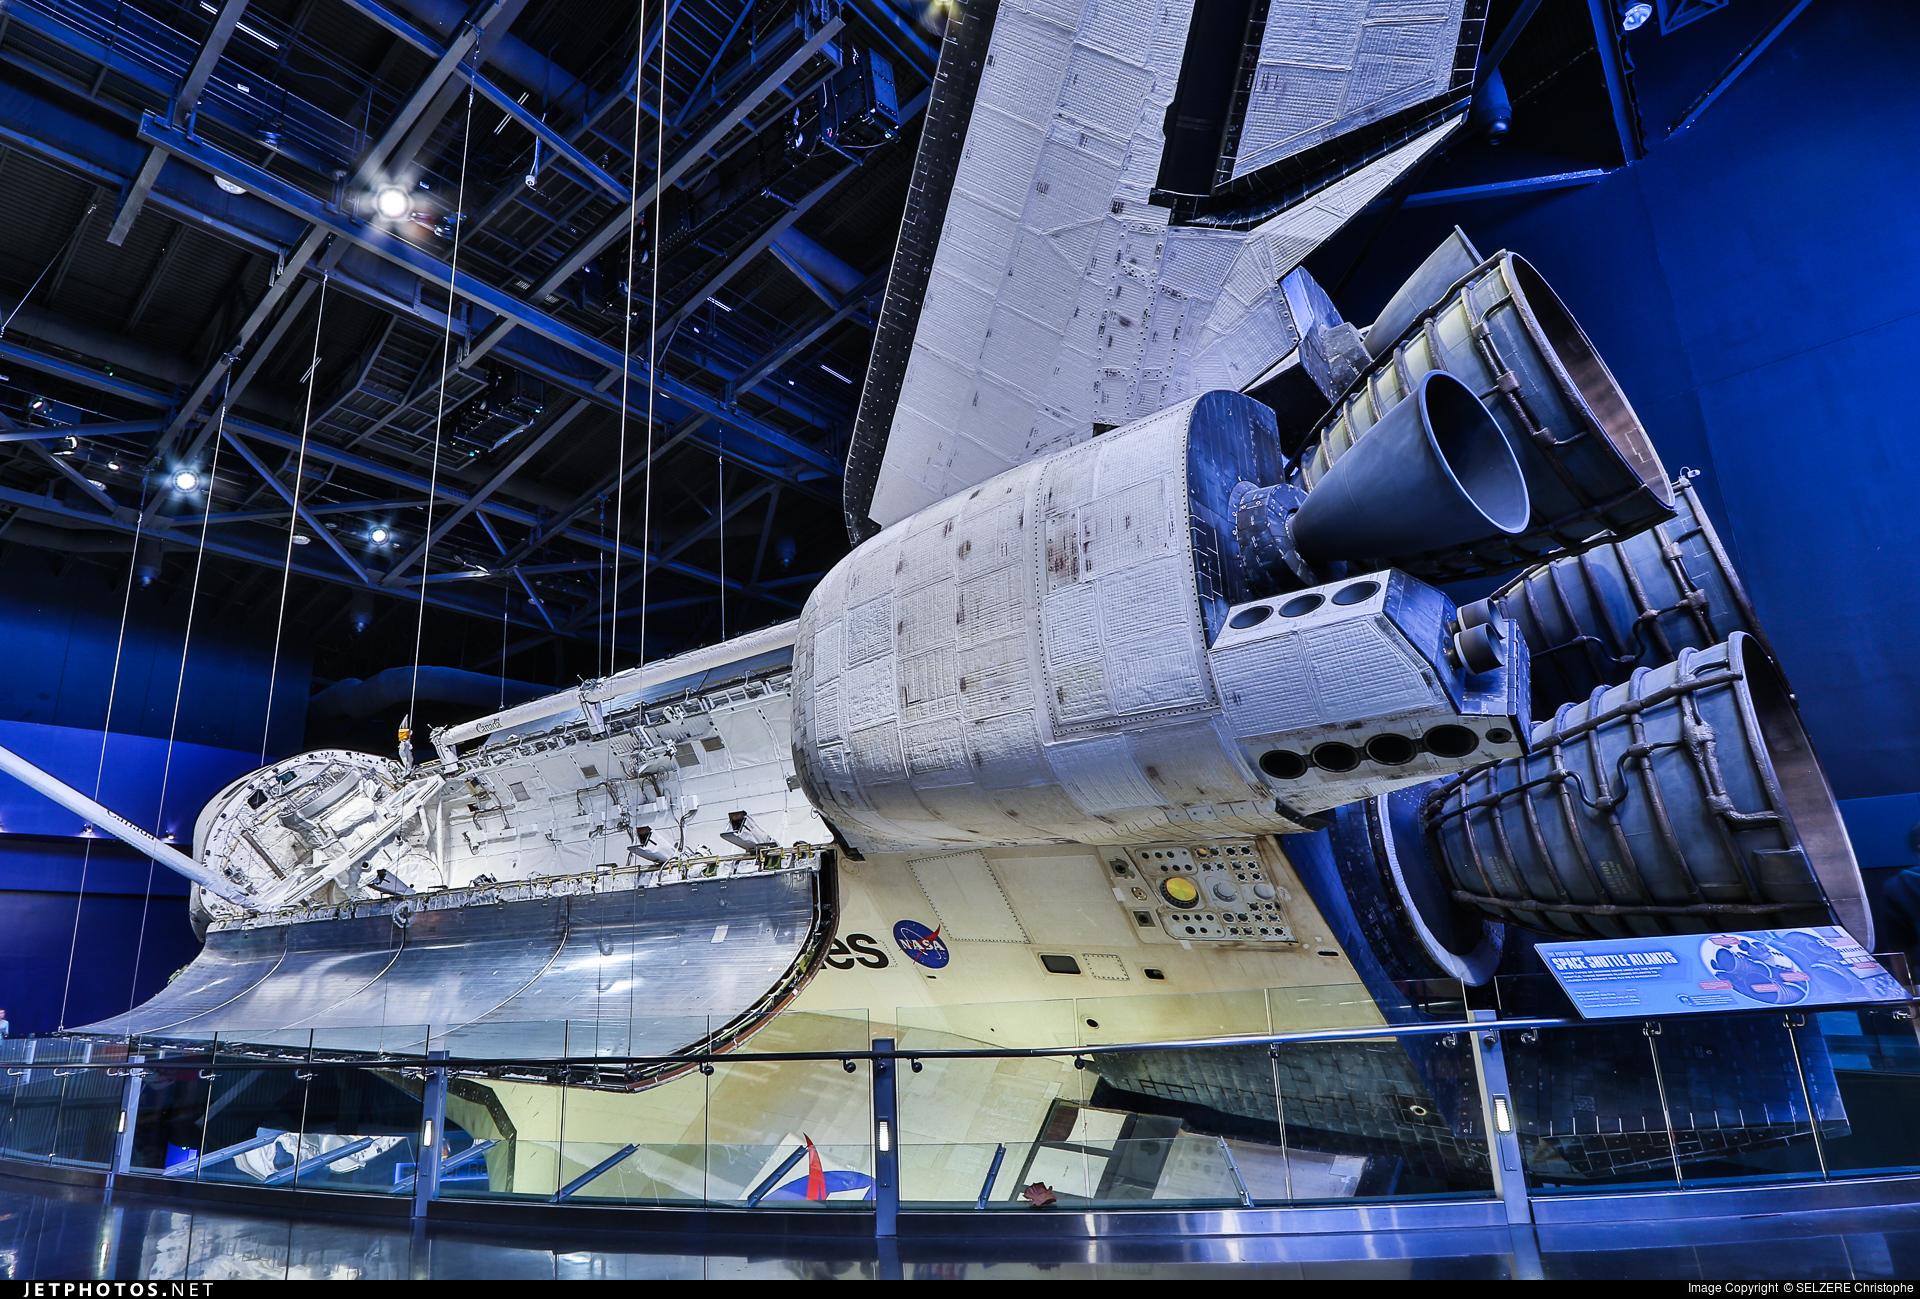 space shuttle orbiter - photo #25